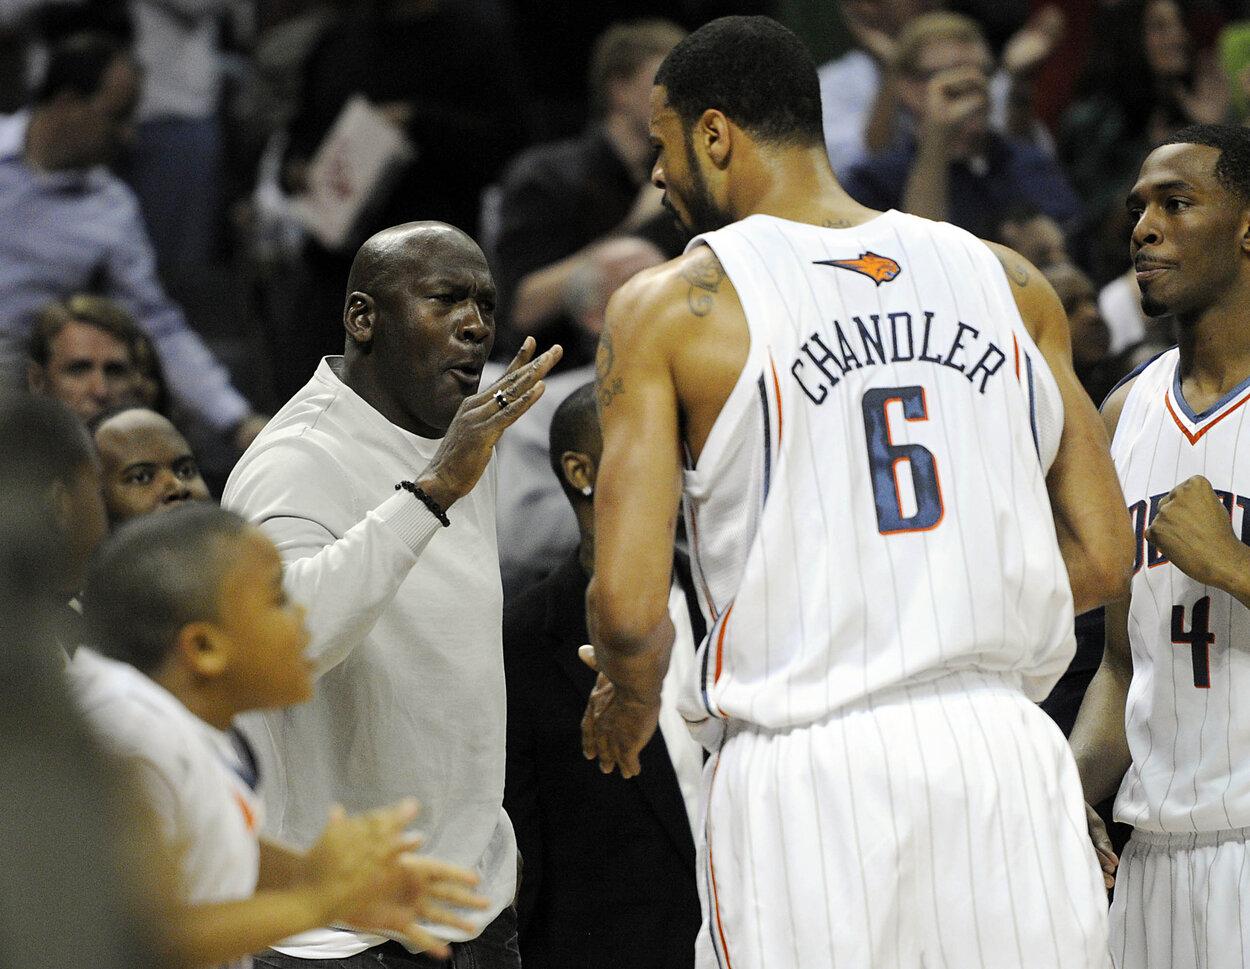 Michael Jordan (L) bought the Charlotte Bobcats in 2010.